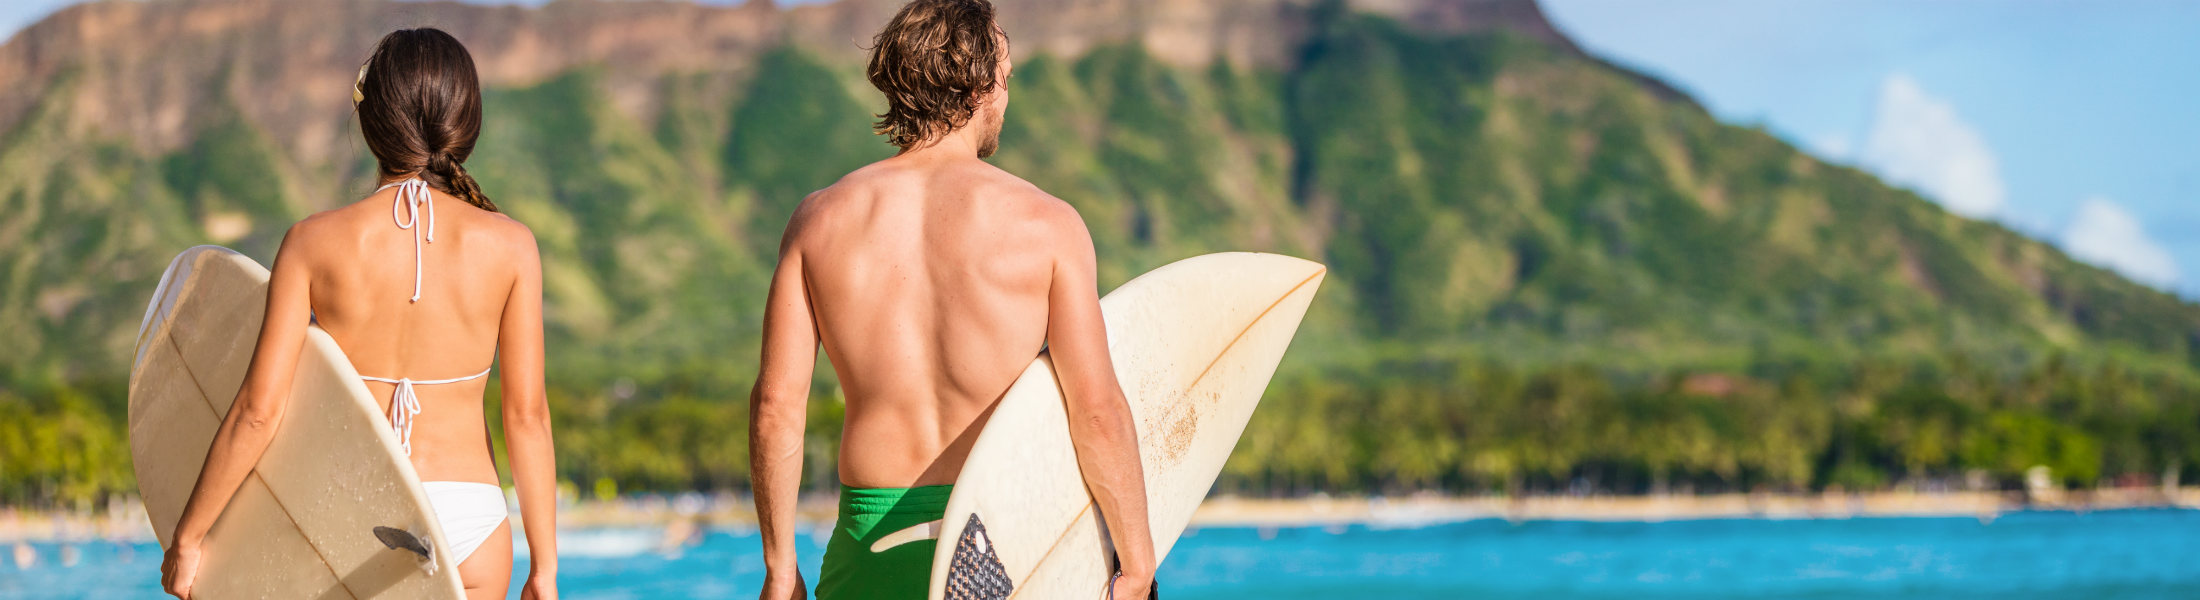 Hawaii surfers people relaxing on waikiki beach